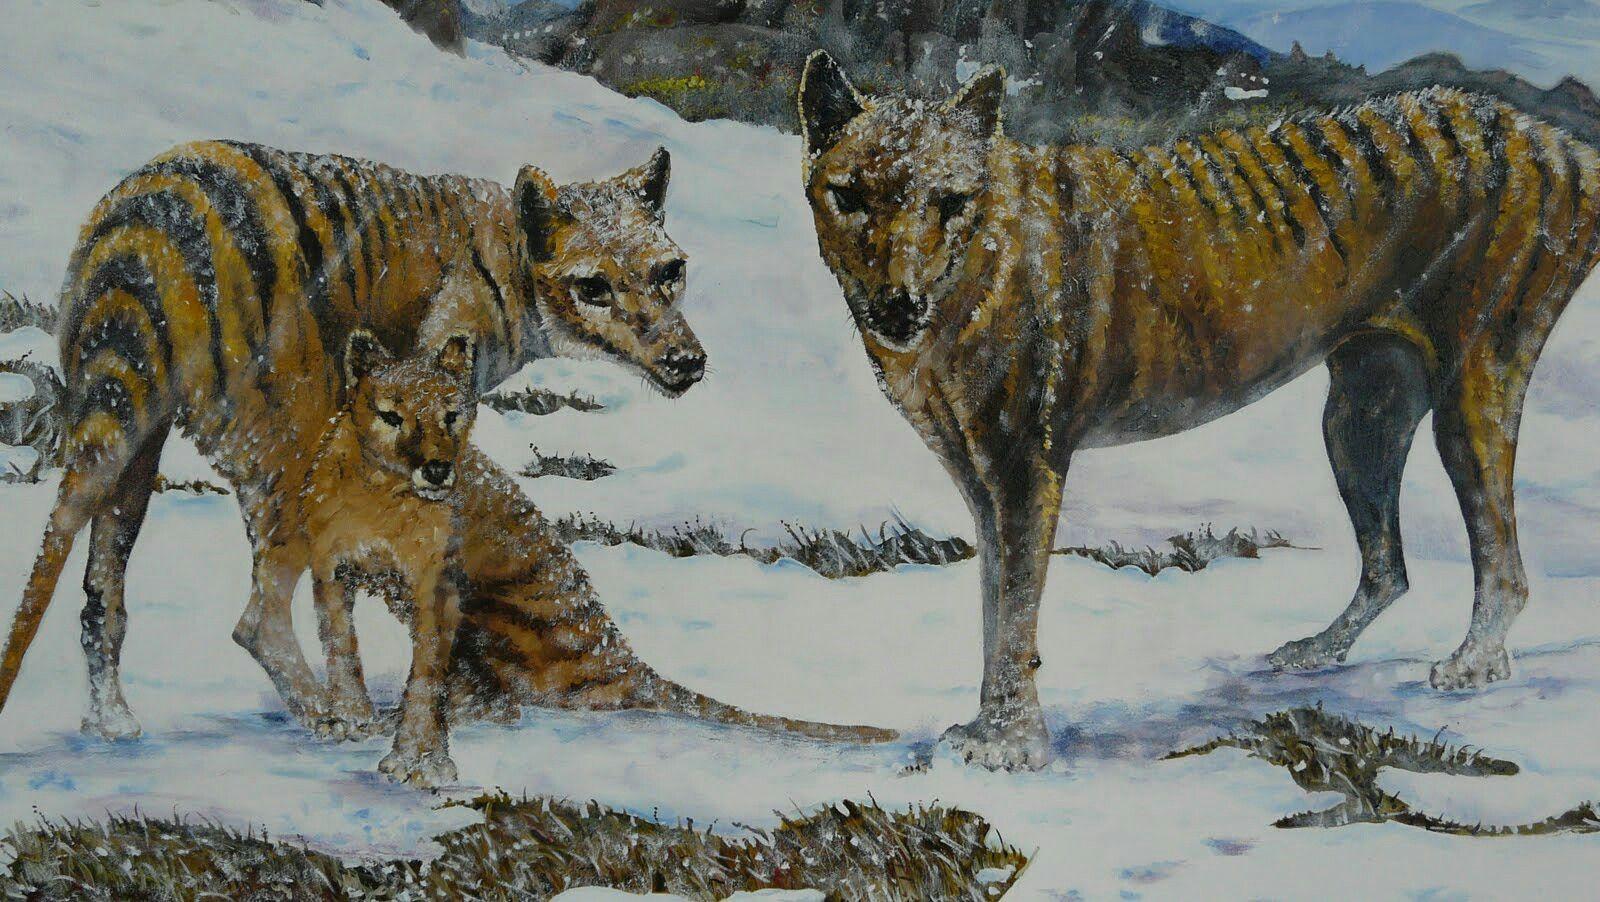 The recently extinct Thylacinus cynocephalus Tasmanian